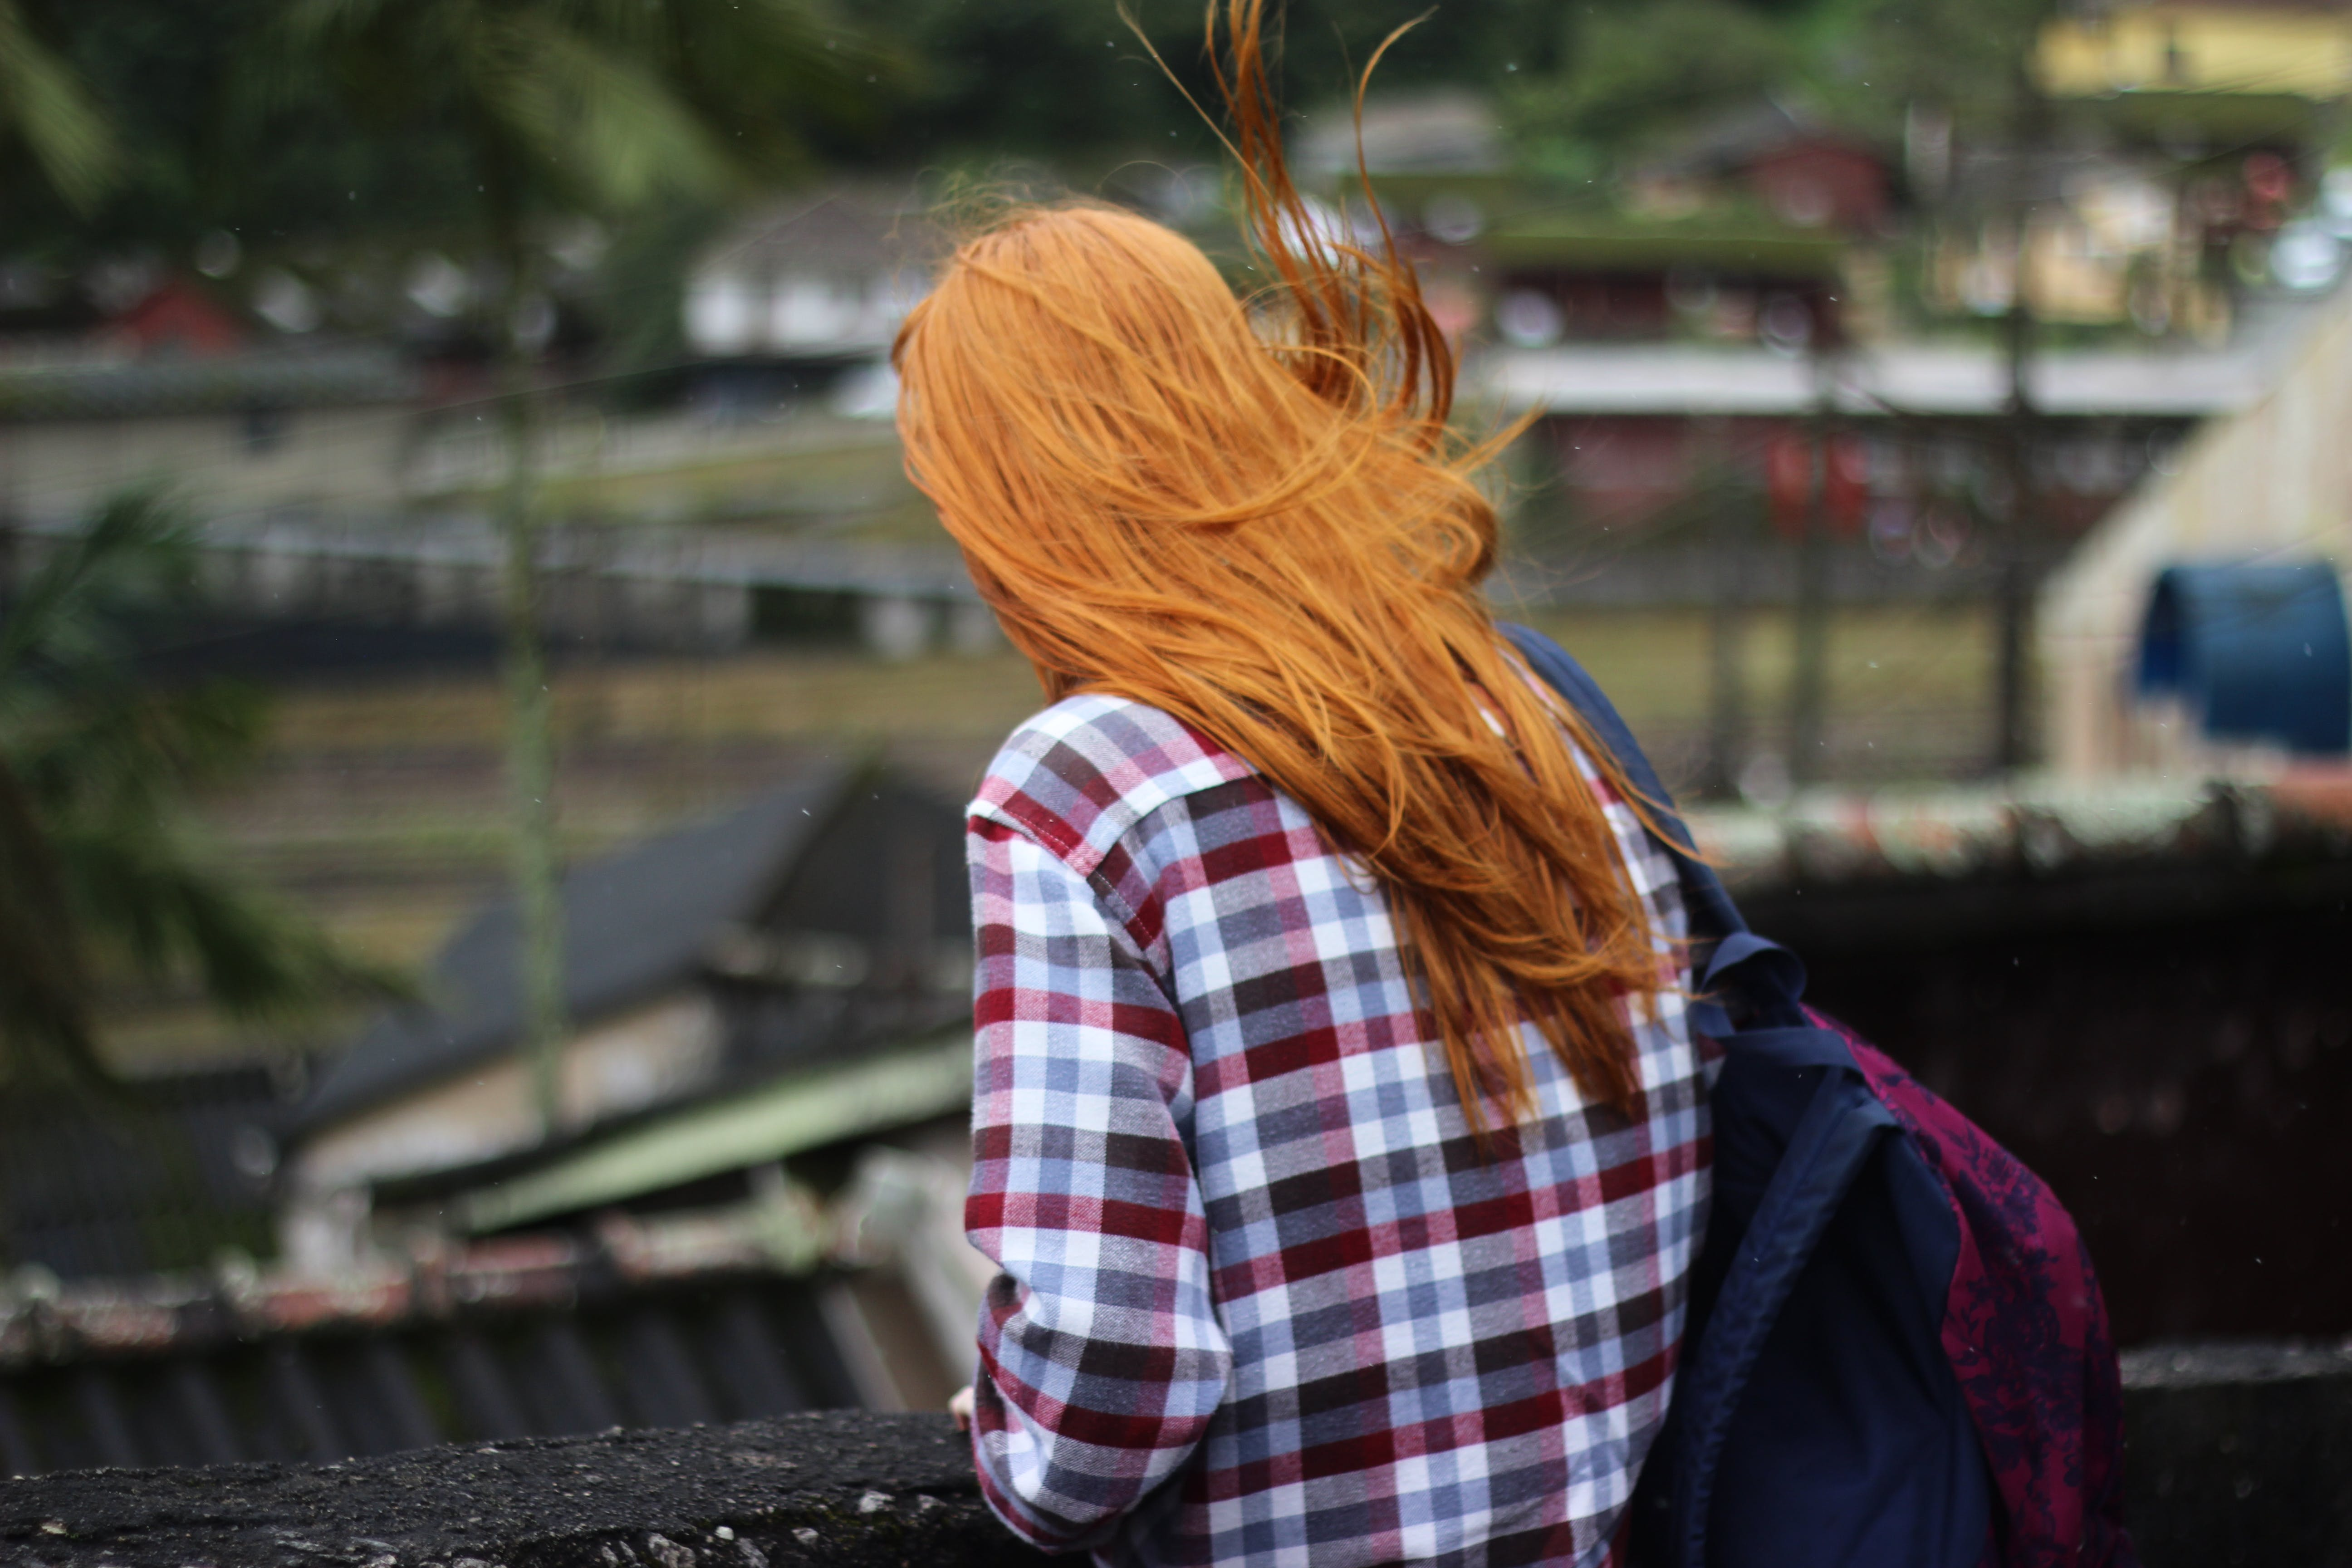 Kostenloses Stock Foto zu erwachsener, estação, frau, freizeit